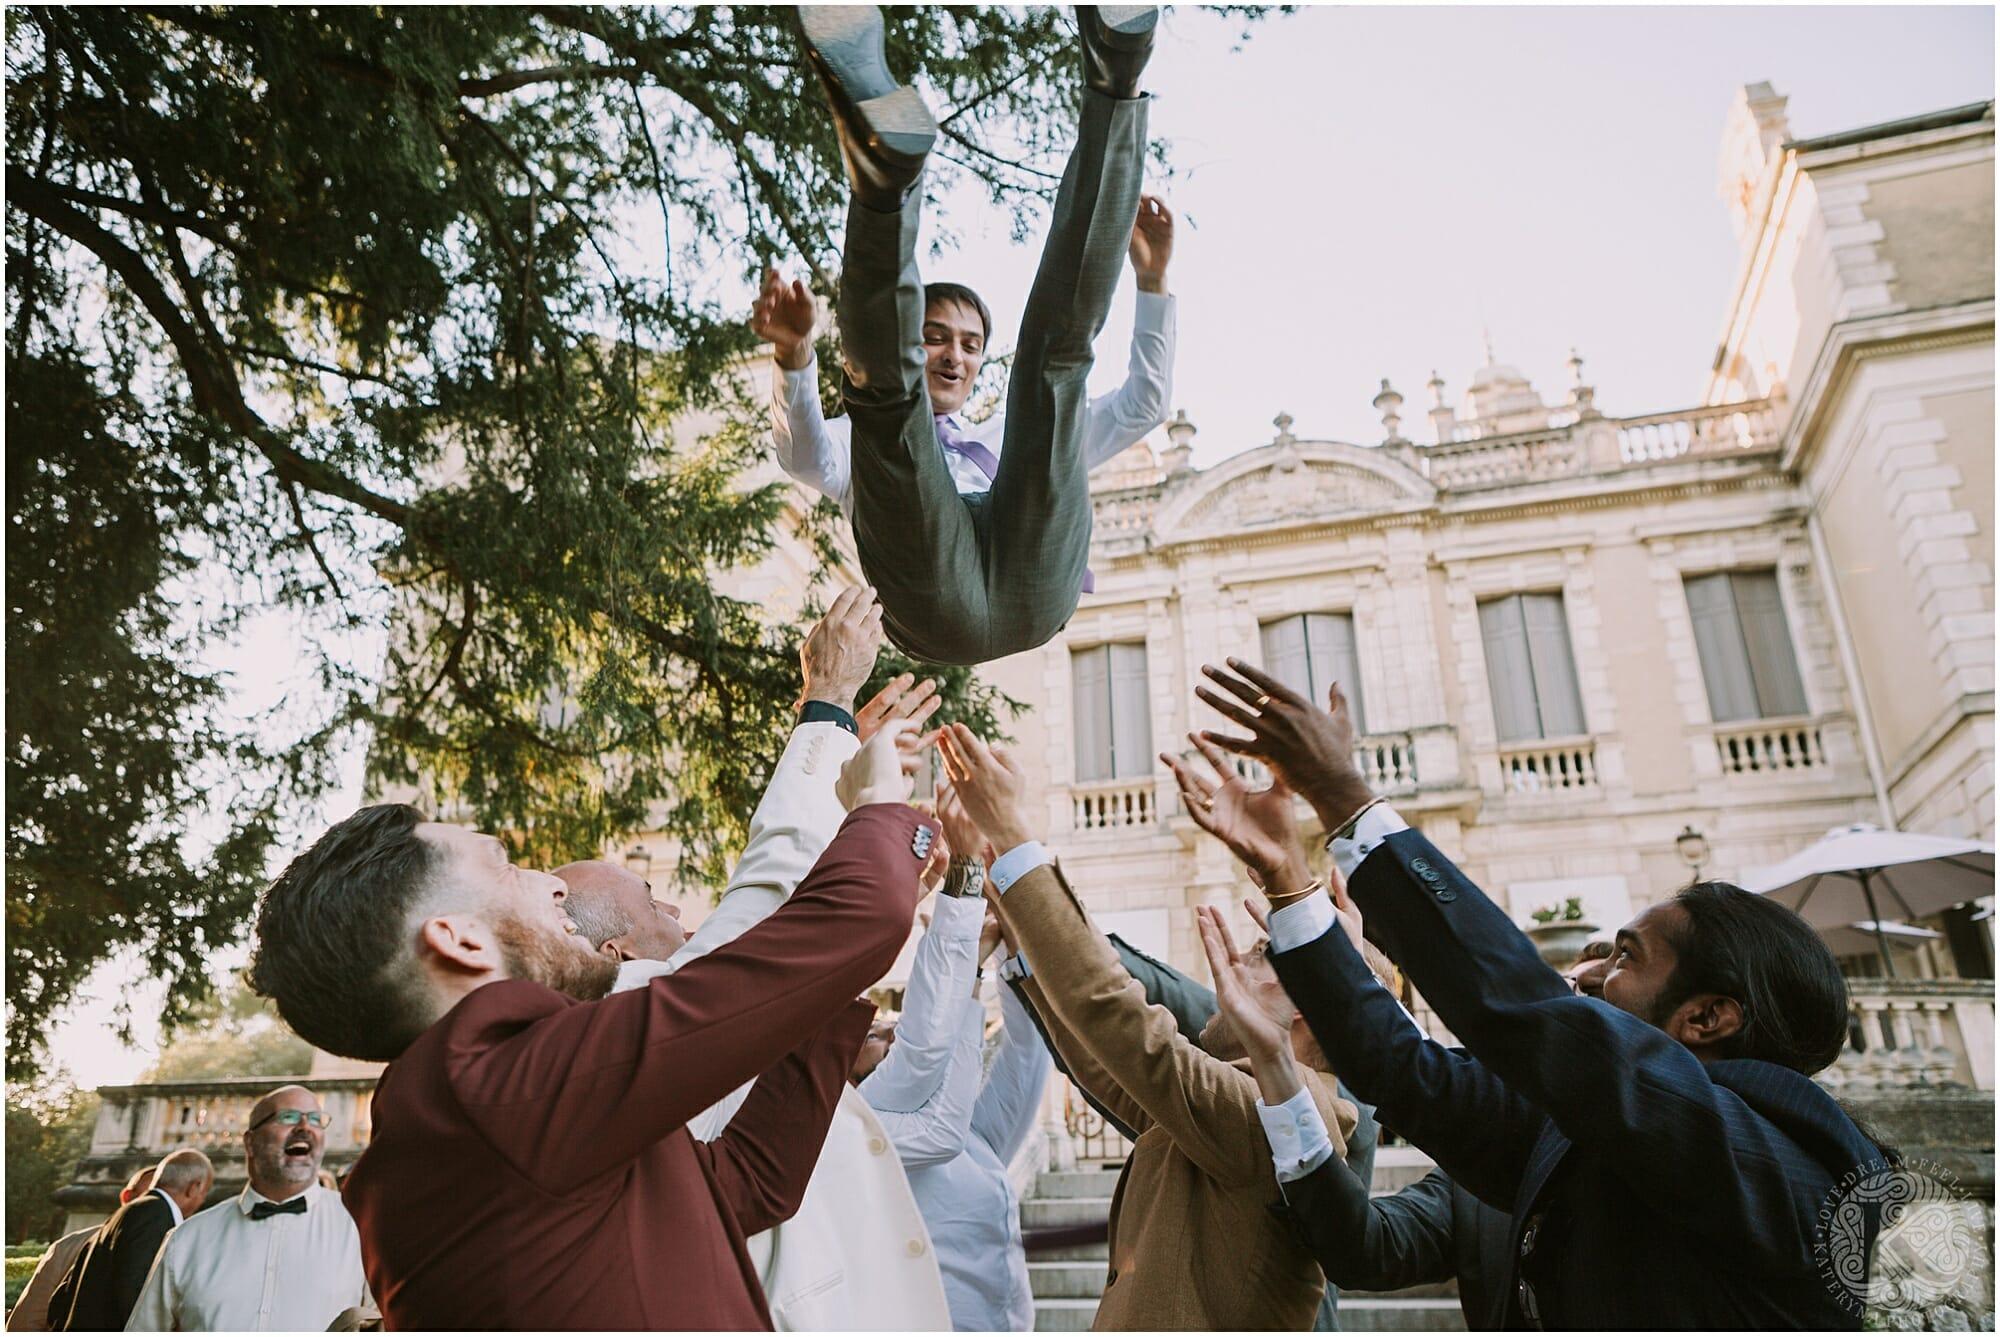 Kateryna-photos-photographe-mariage-chateau-des-3-fontaines-provence-avignon-vaucluse-sud_0075.jpg